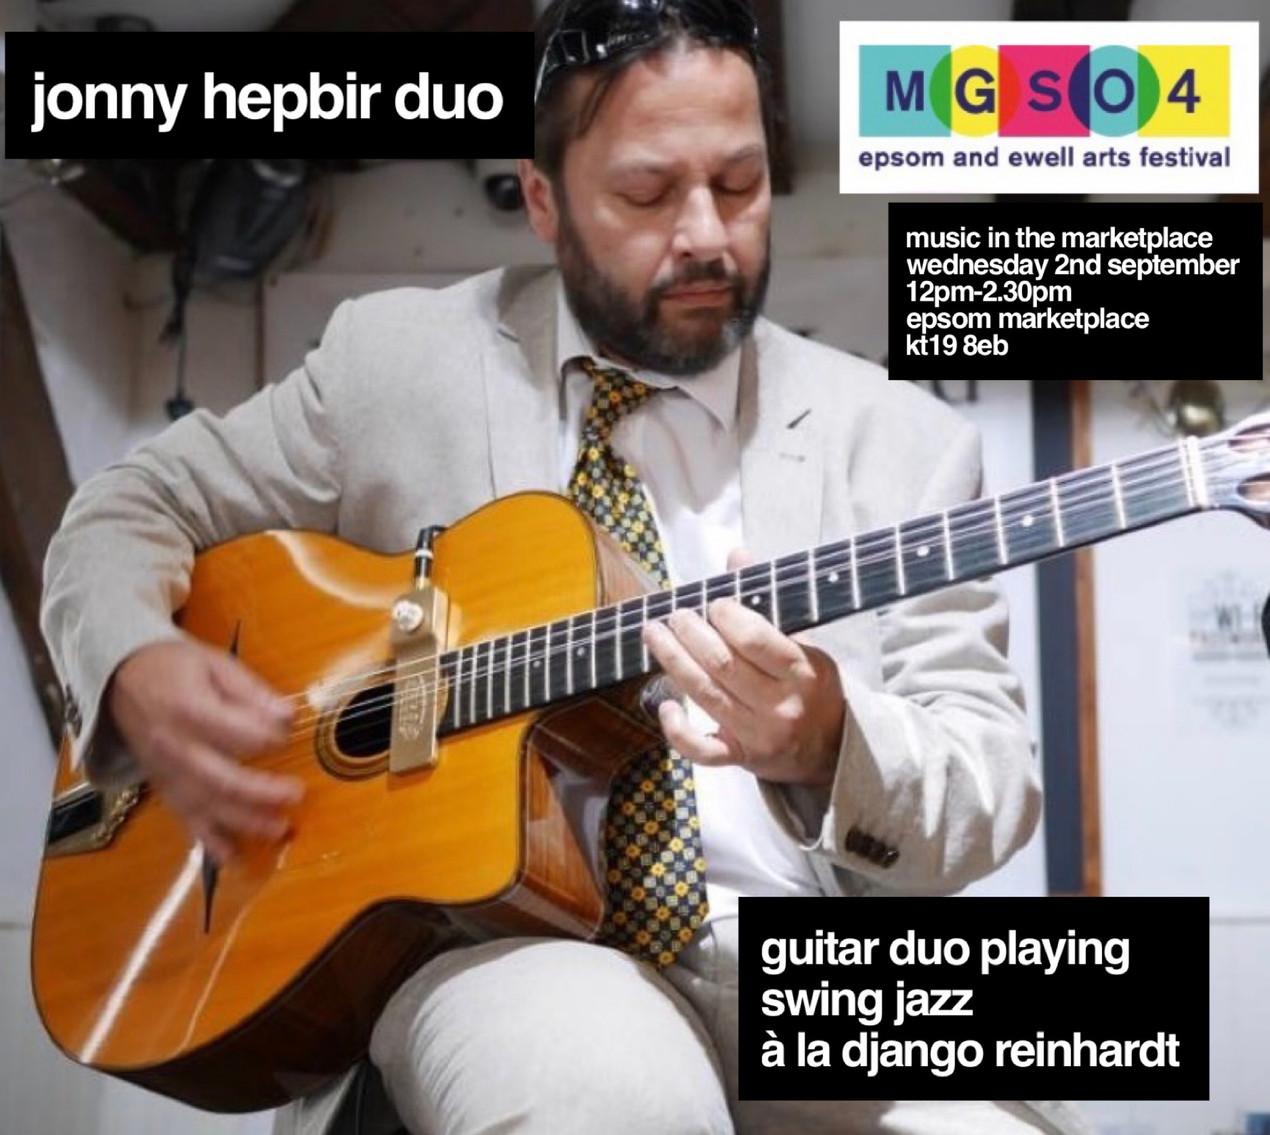 Jonny Hepbir Gypsy Jazz Guitar Duo Live At Epsom Marketplace, Surrey Wednesday 2nd September